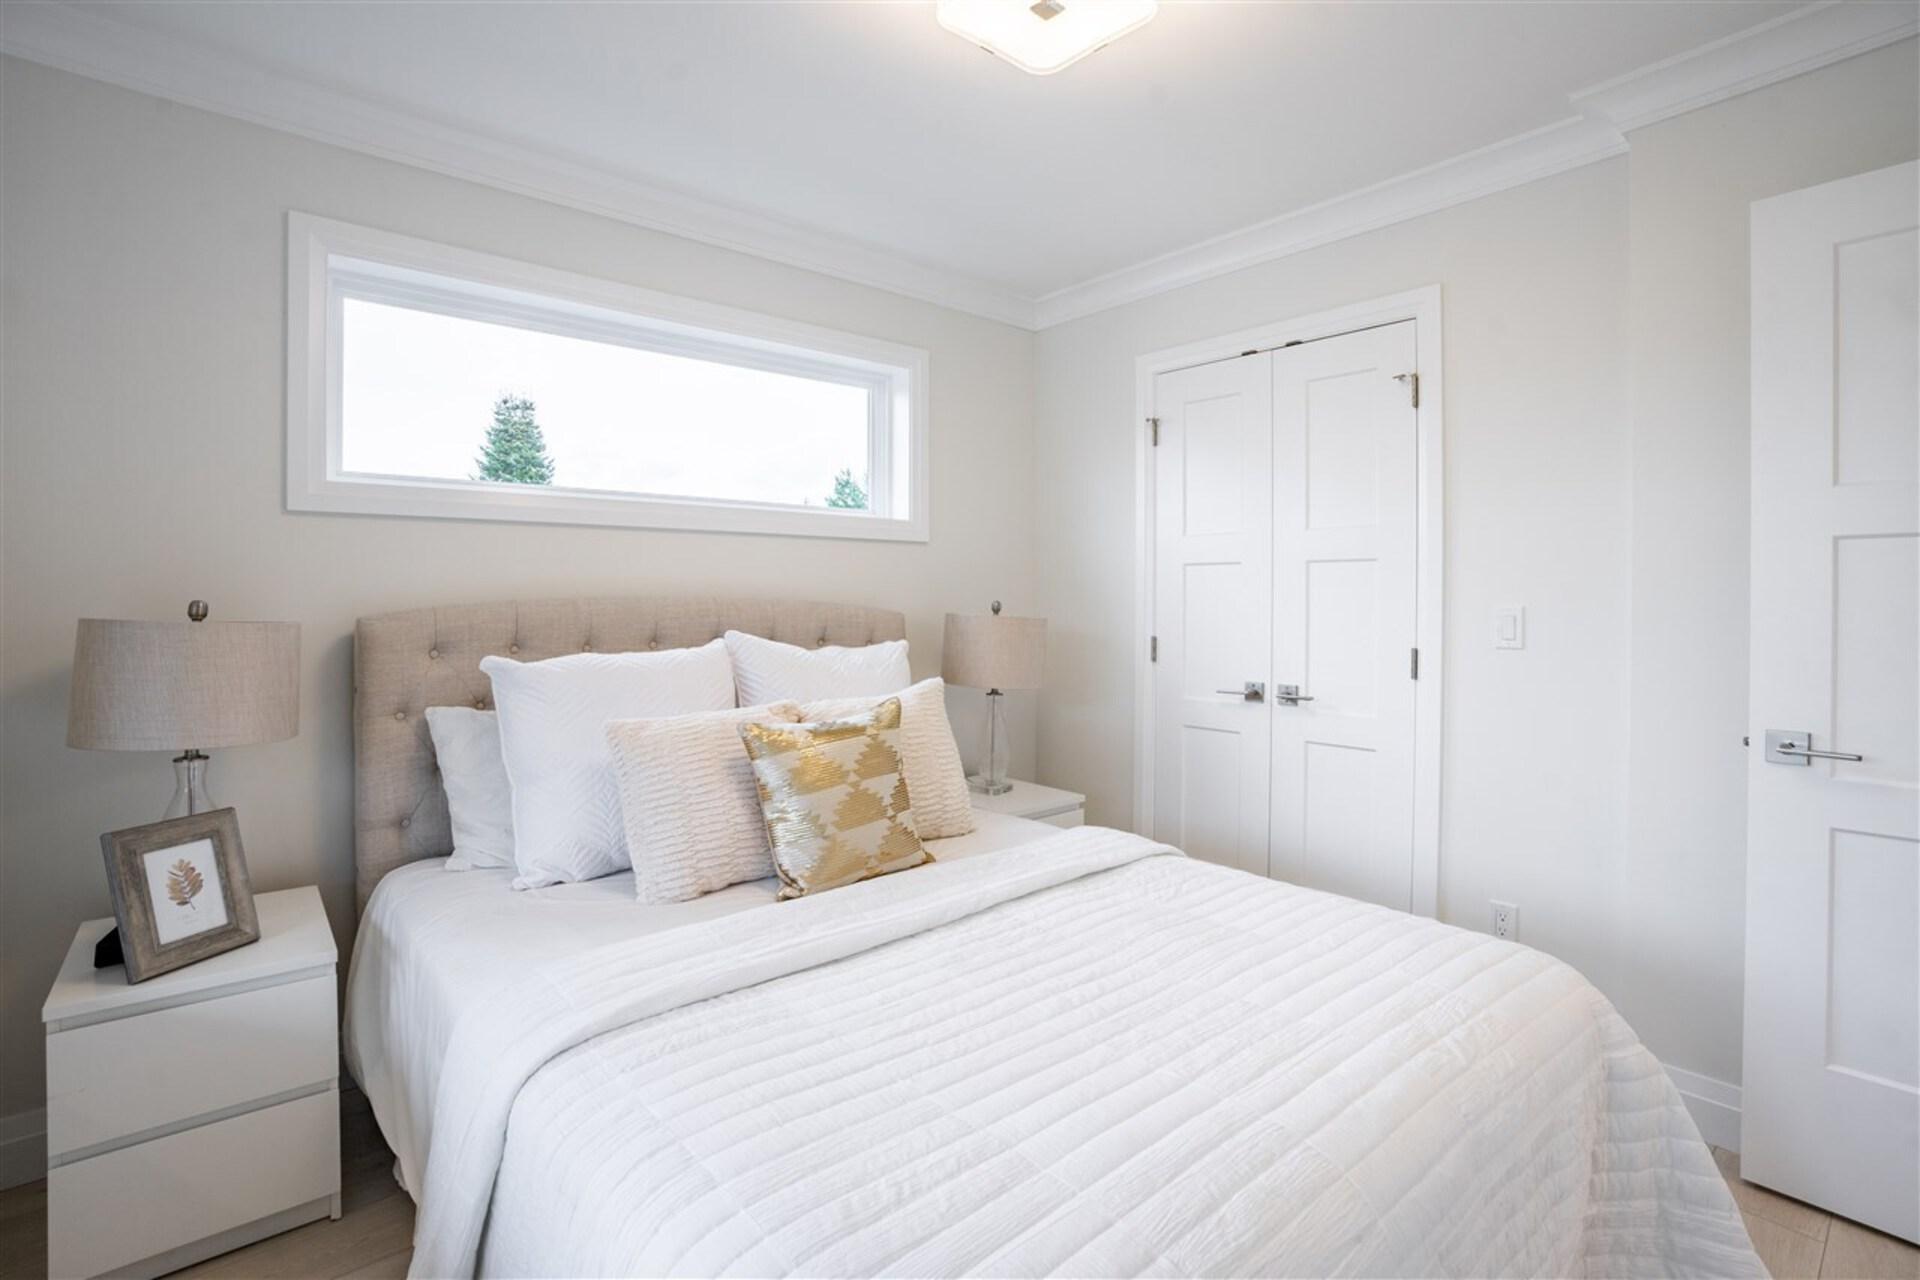 5607-royal-oak-avenue-forest-glen-bs-burnaby-south-23 at 5607 Royal Oak Avenue, Forest Glen BS, Burnaby South